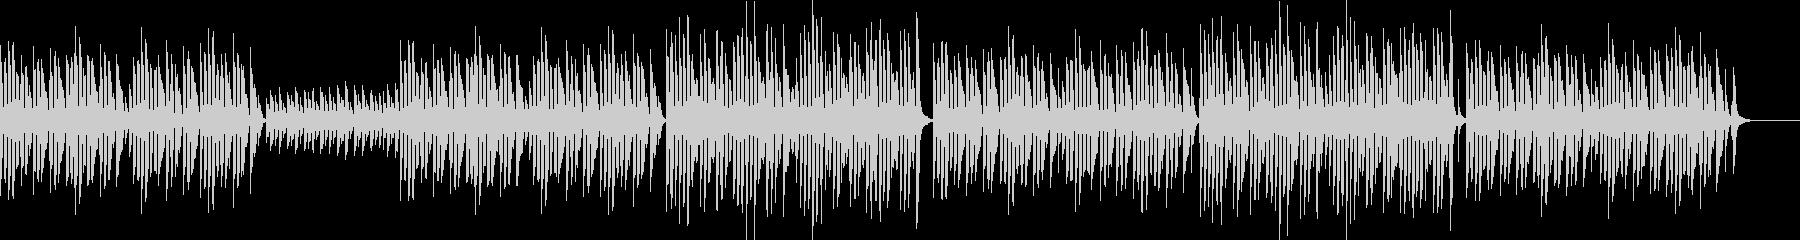 bpm080 キッズTikTok可愛い笛の未再生の波形